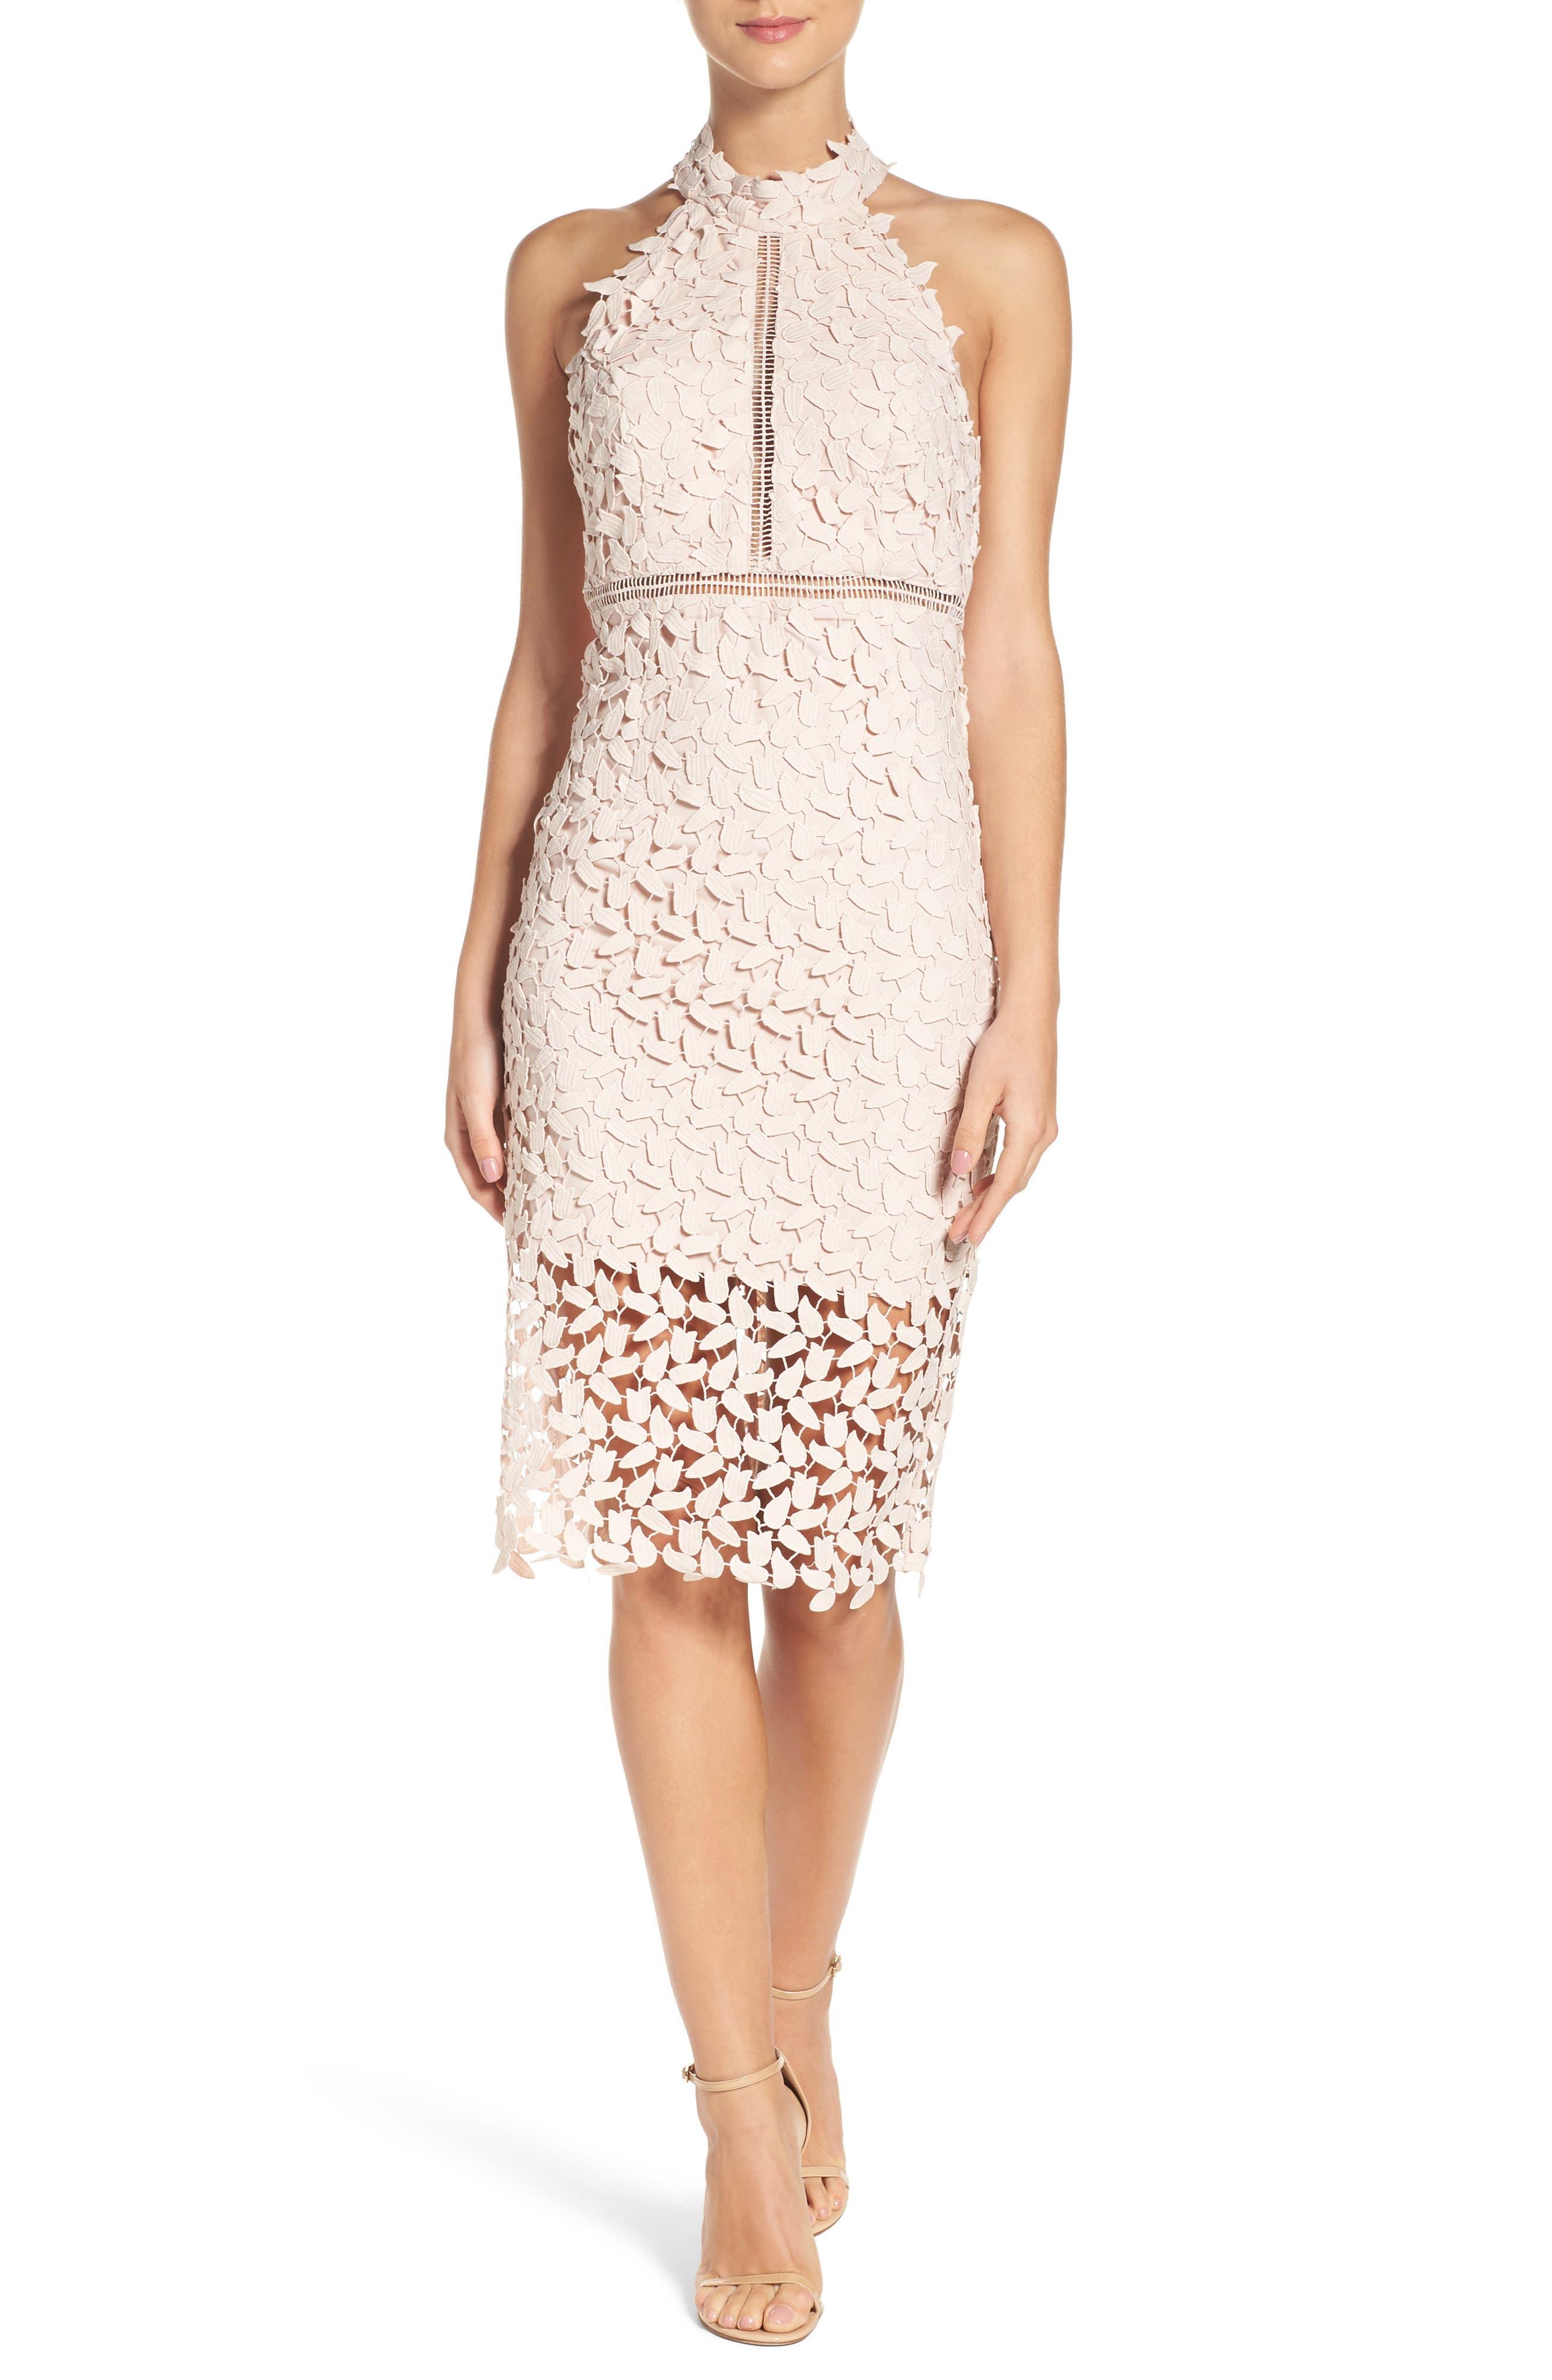 BARDOT, Gemma Halter Lace Sheath Dress, Main thumbnail 1, color, PROSECCO